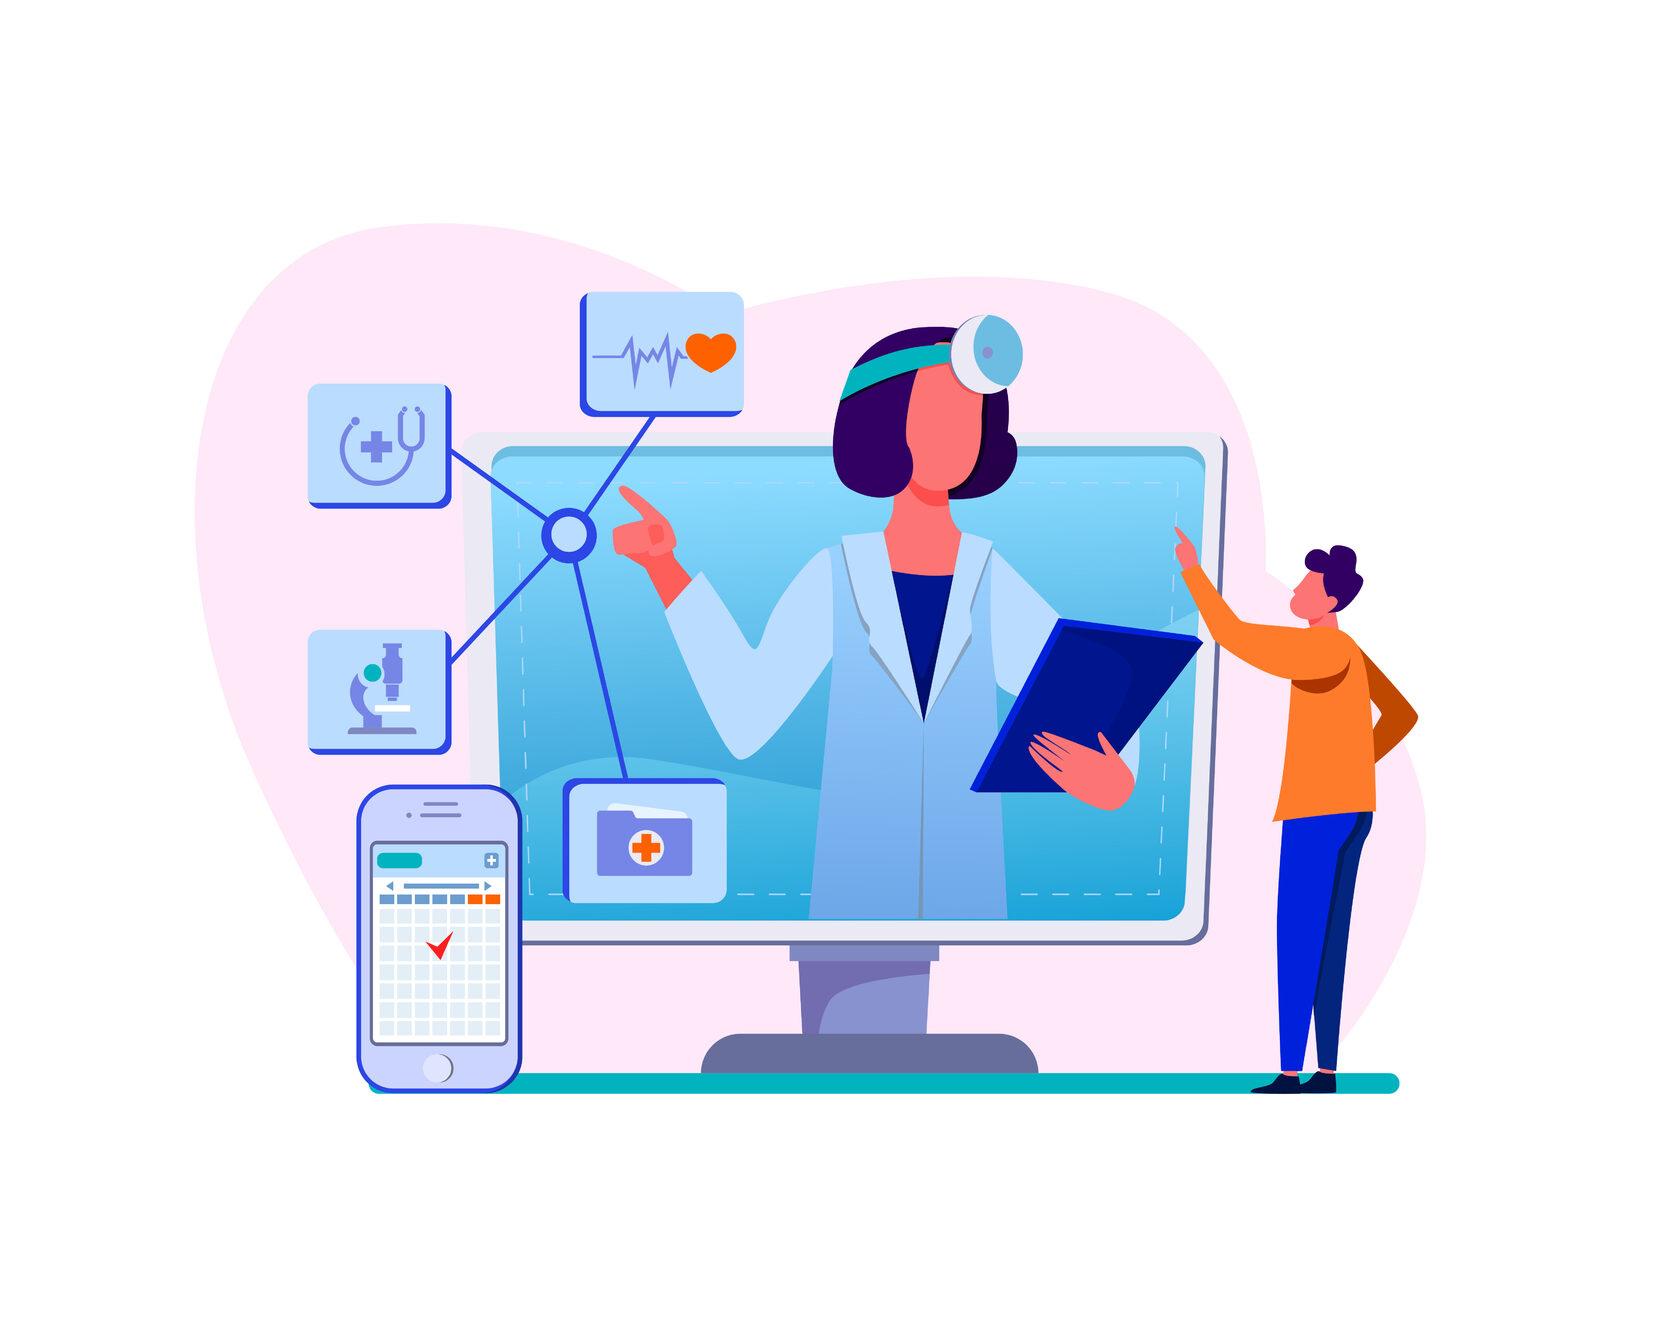 Консультация с врачом онлайн: топ 8 сервисов по телемедицине